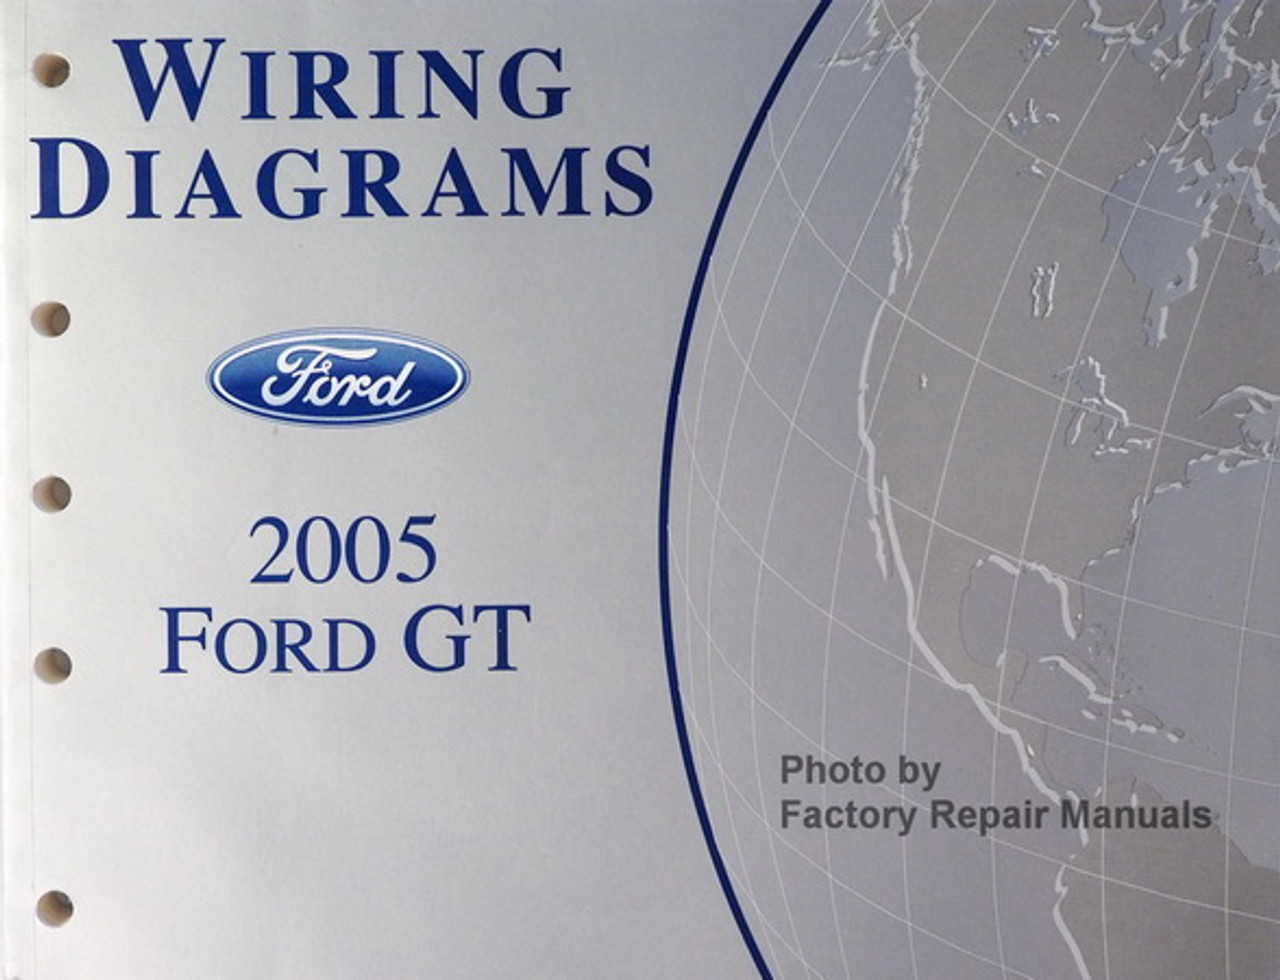 2005 Ford GT Electrical Wiring Diagrams Original Manual - Factory Repair  Manuals | Ford Motor Company Wiring Diagrams |  | Factory Repair Manuals